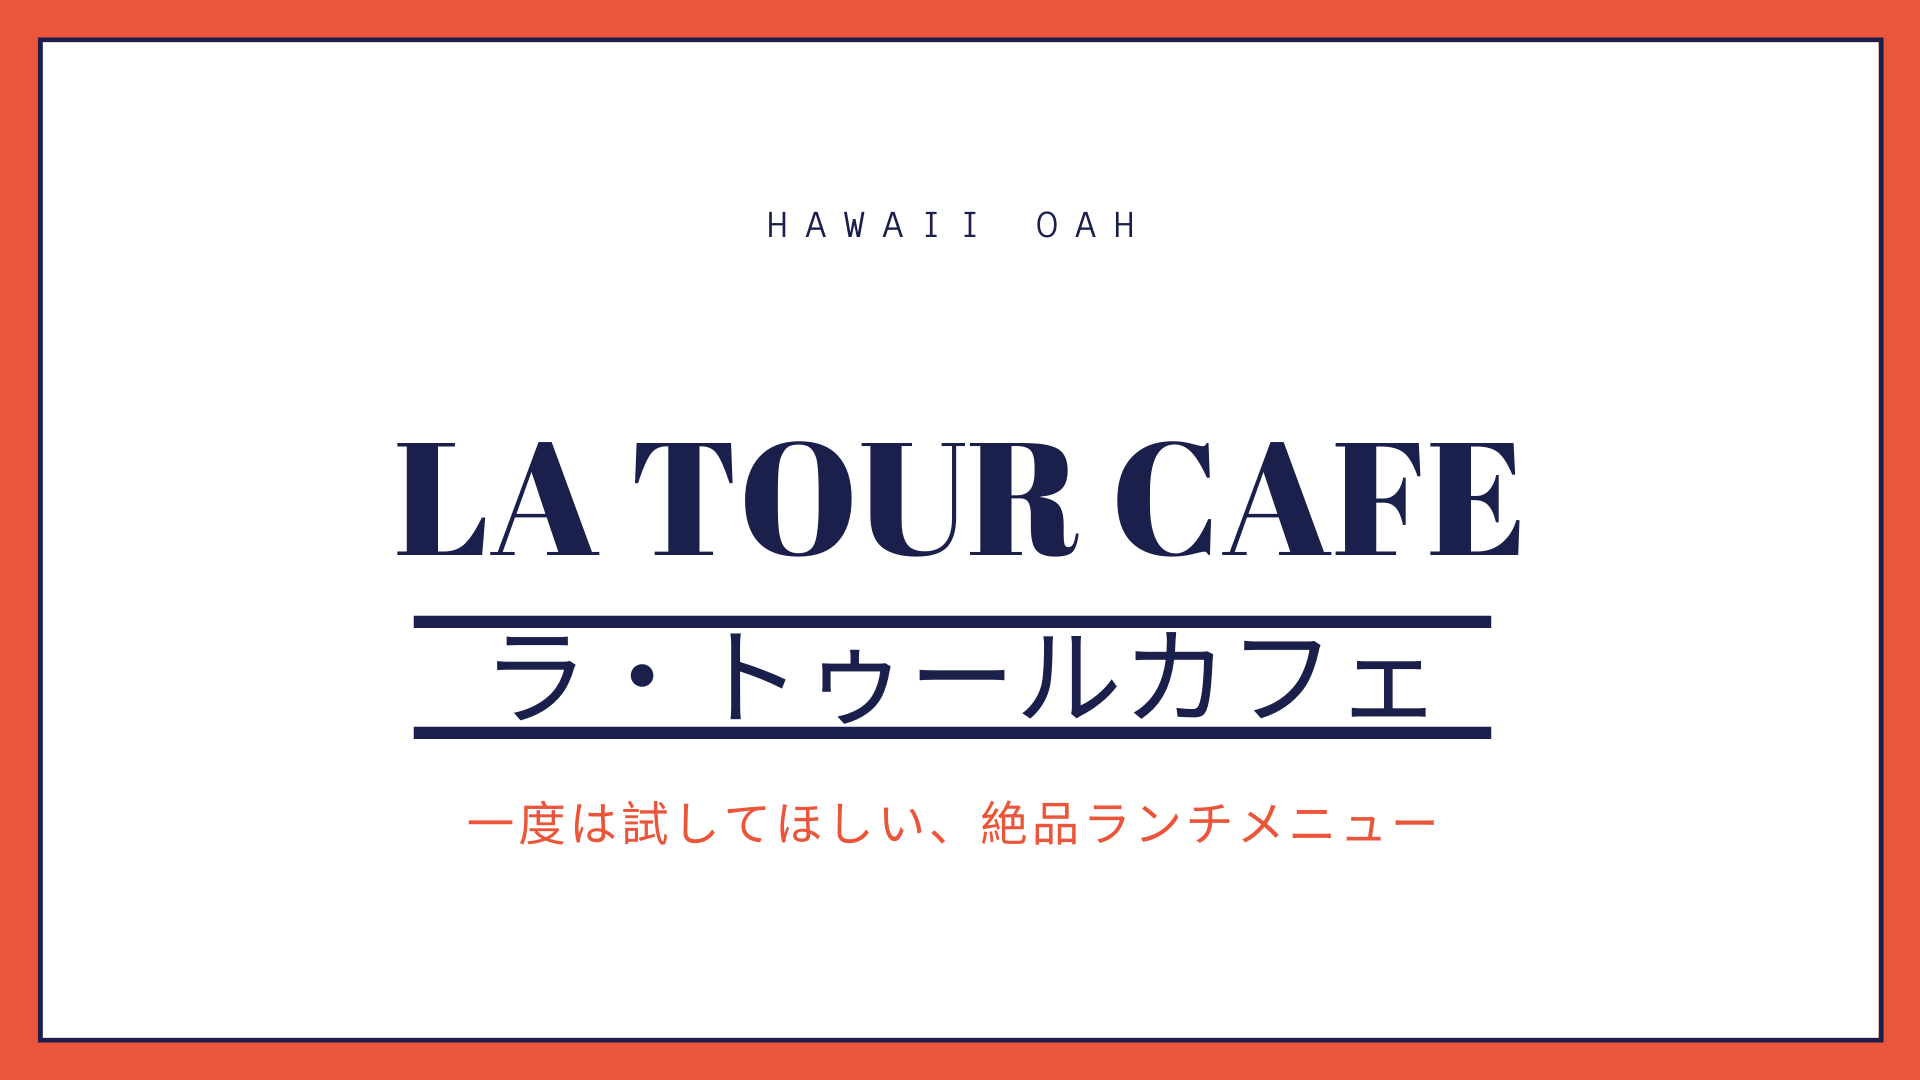 LA TOUR CAFE レストラン